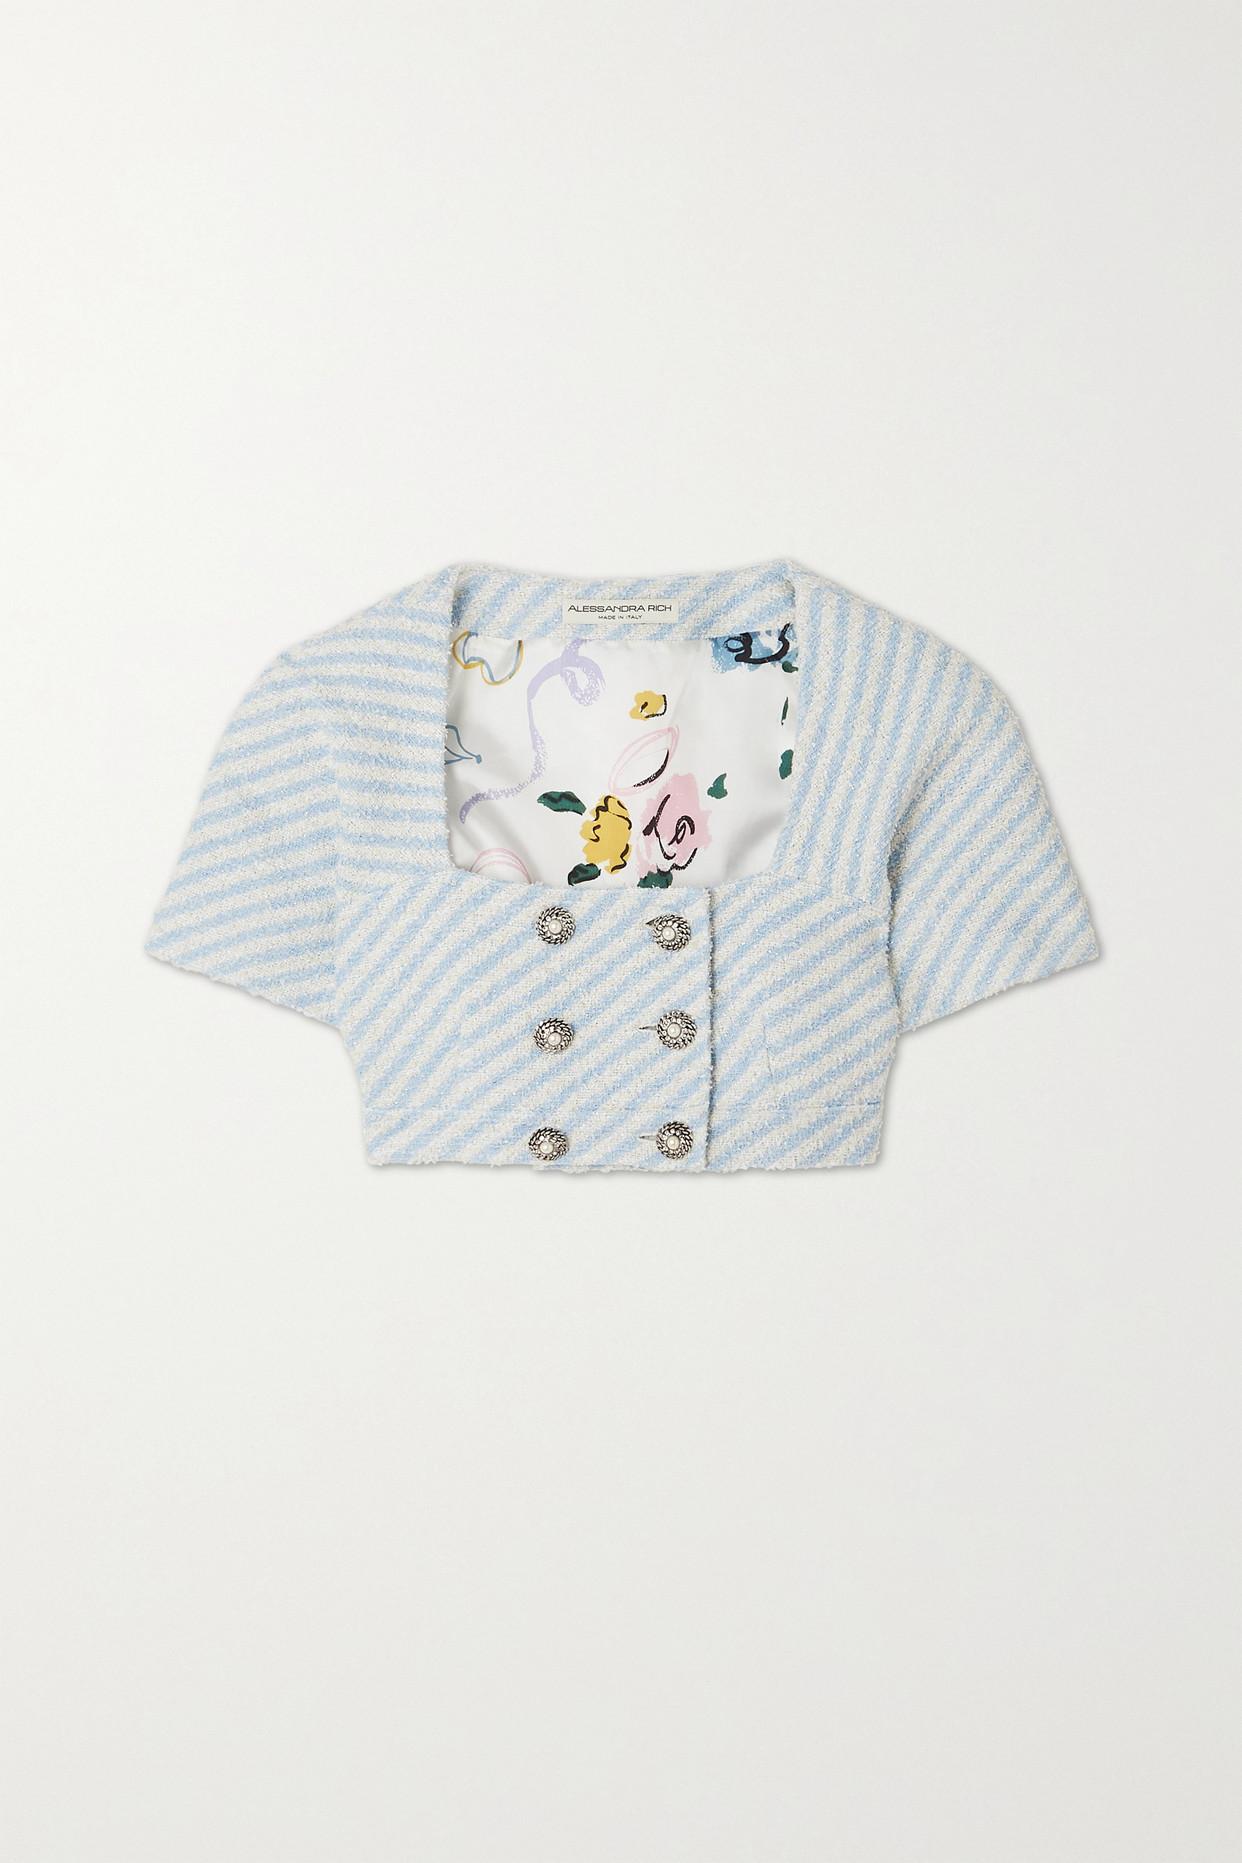 ALESSANDRA RICH - Cropped Striped Cotton-blend Tweed Jacket - Blue - IT36